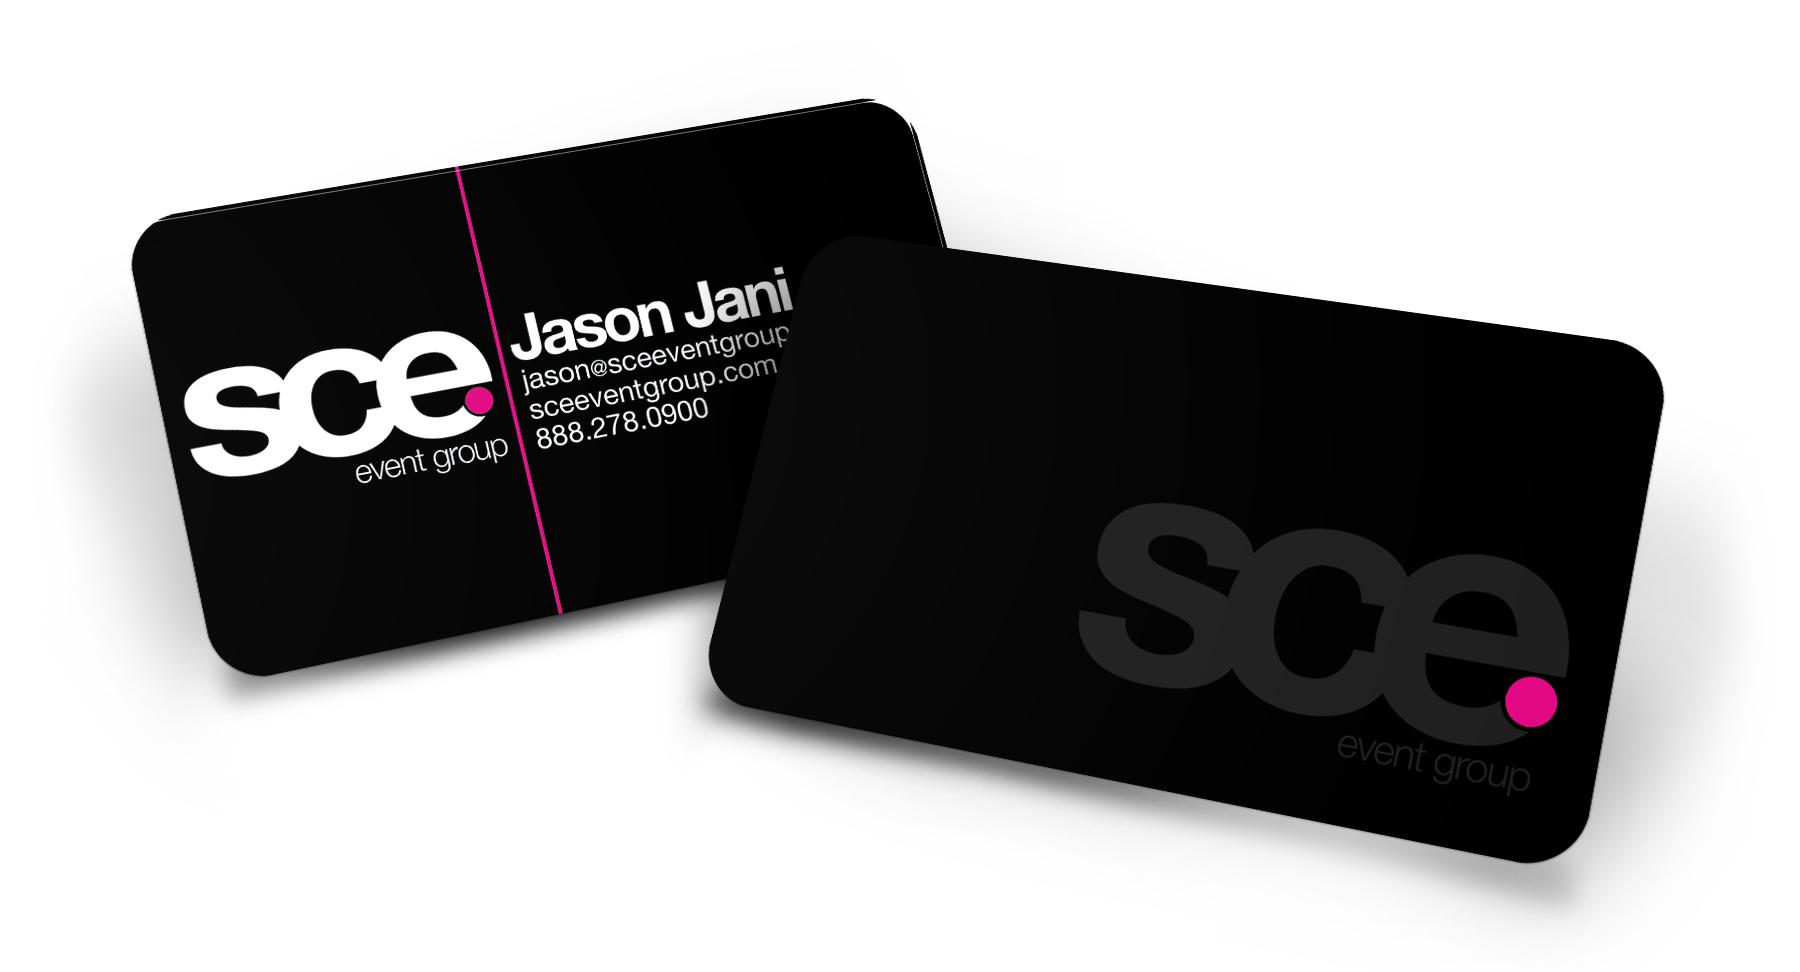 Business card print design screaming lunatic design agency coaster manufacturing company colourmoves